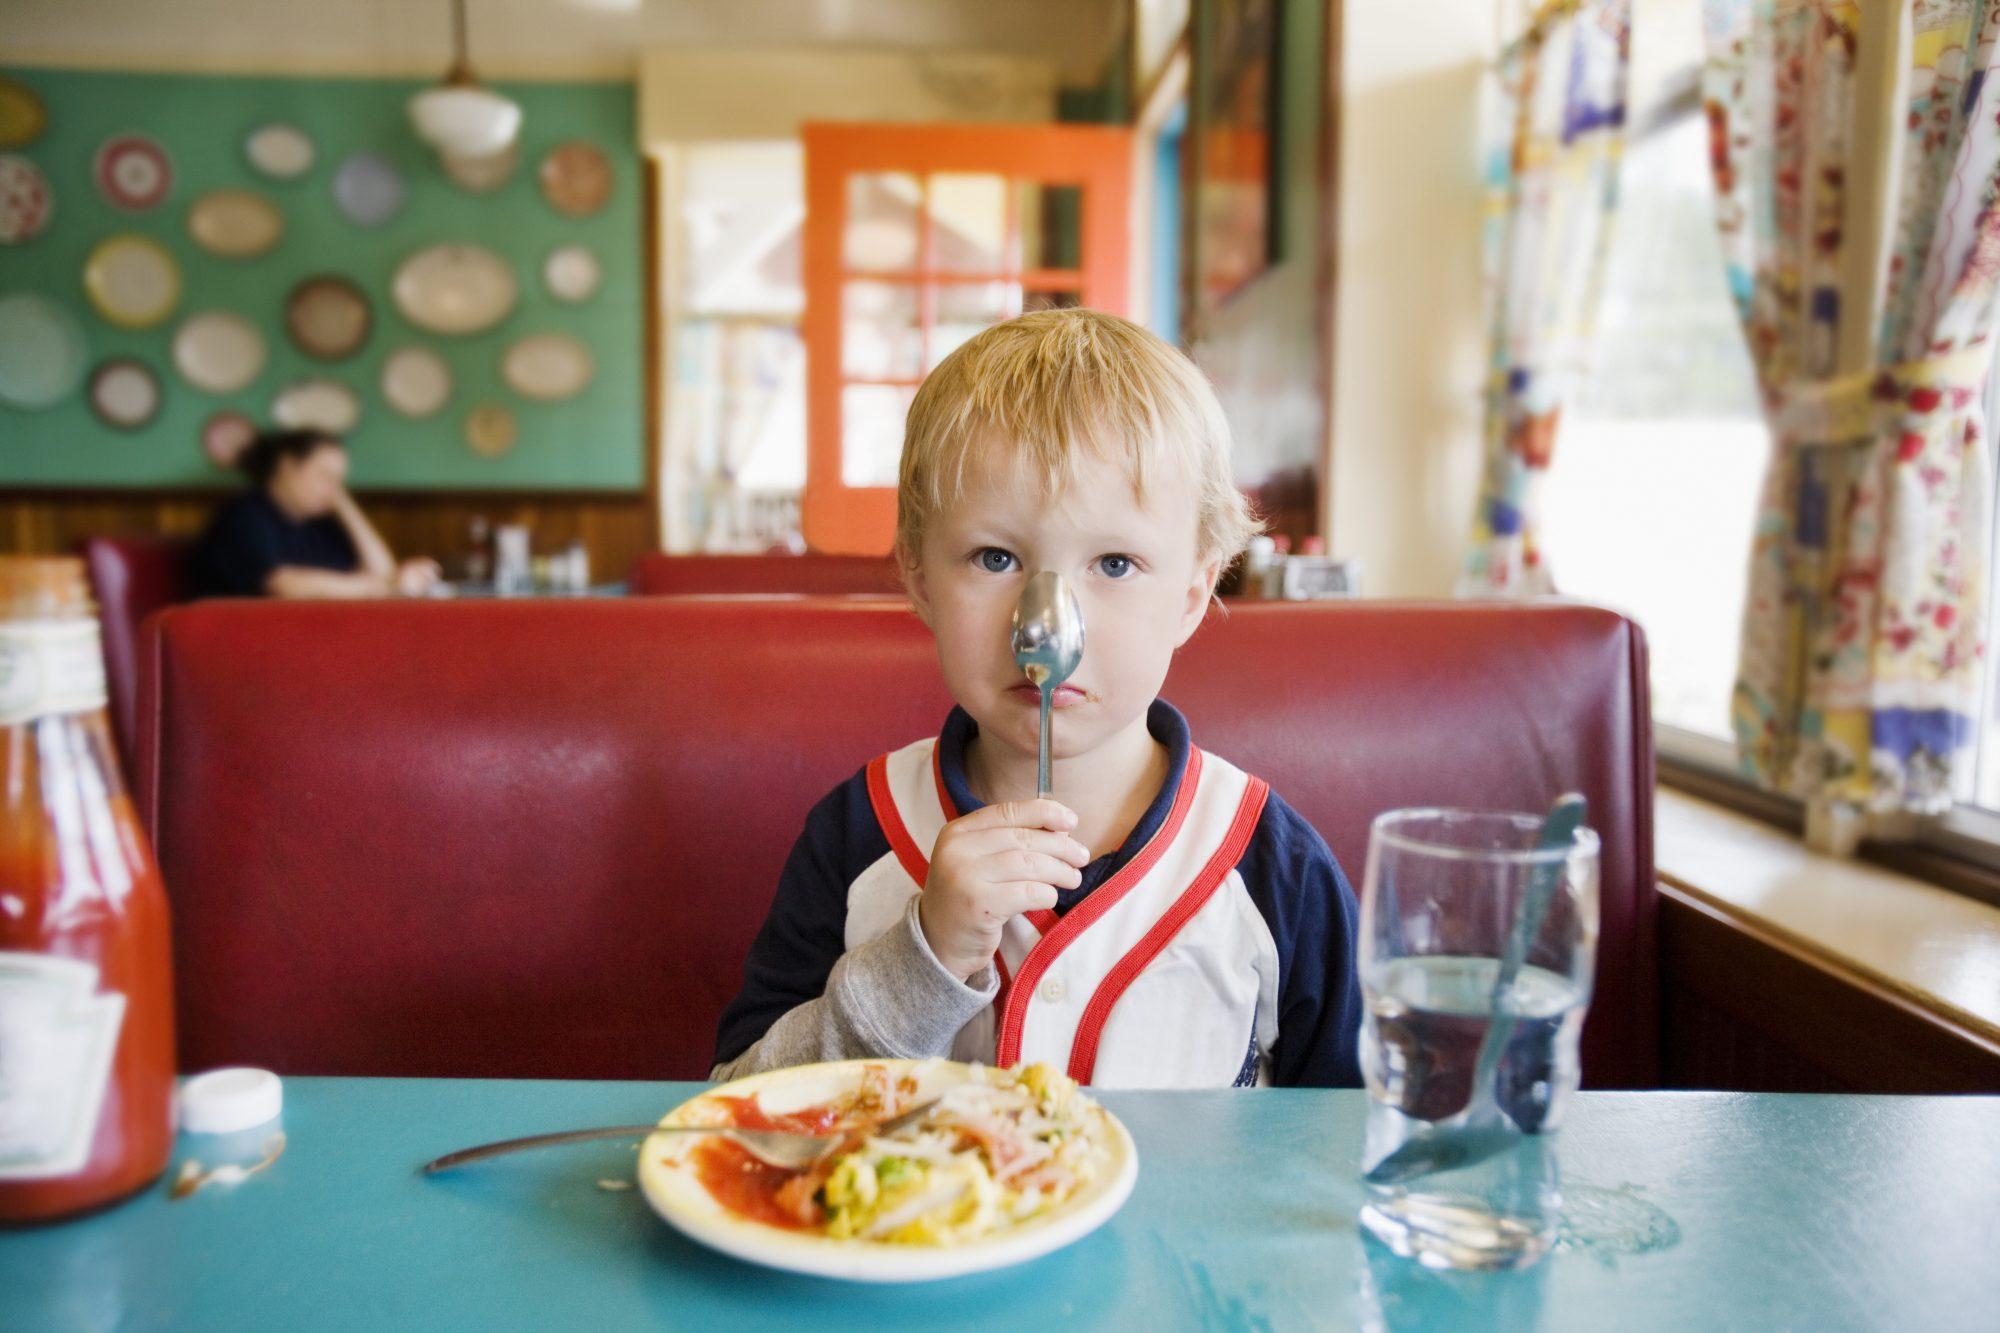 getty-kid-in-restaurant-image